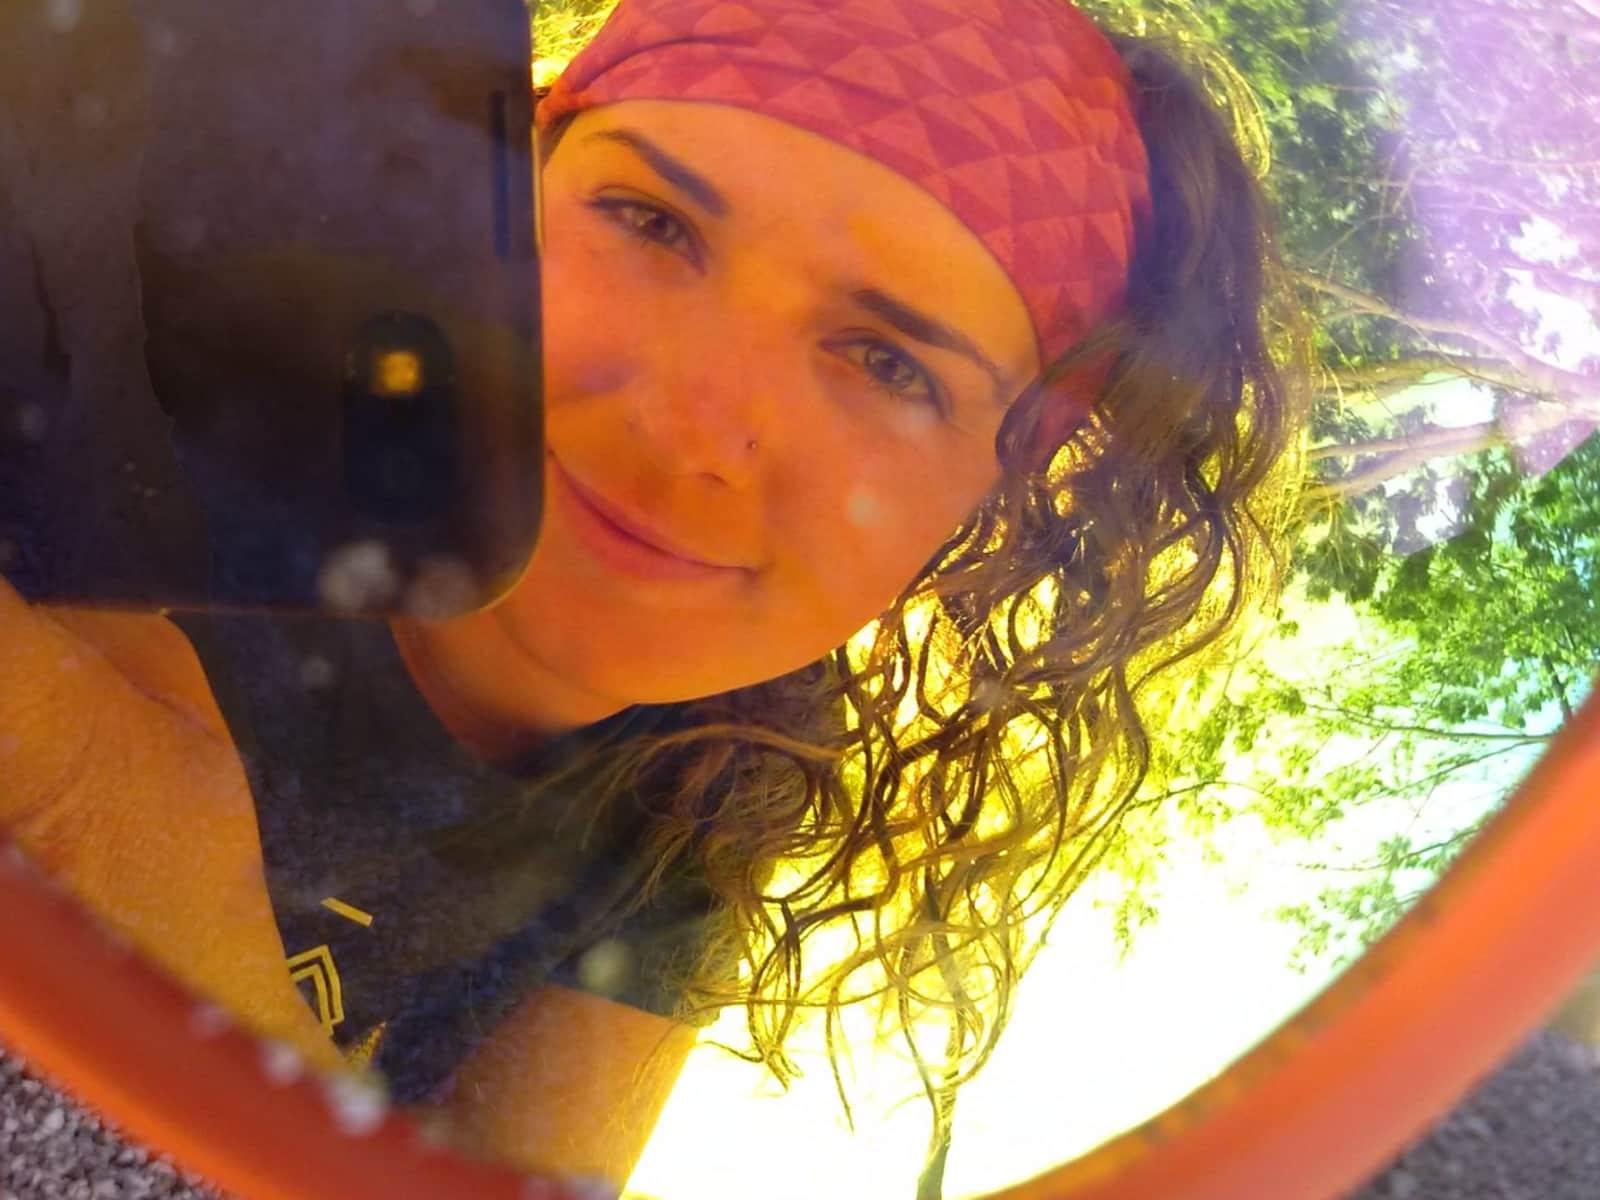 Christine from Victoria, British Columbia, Canada